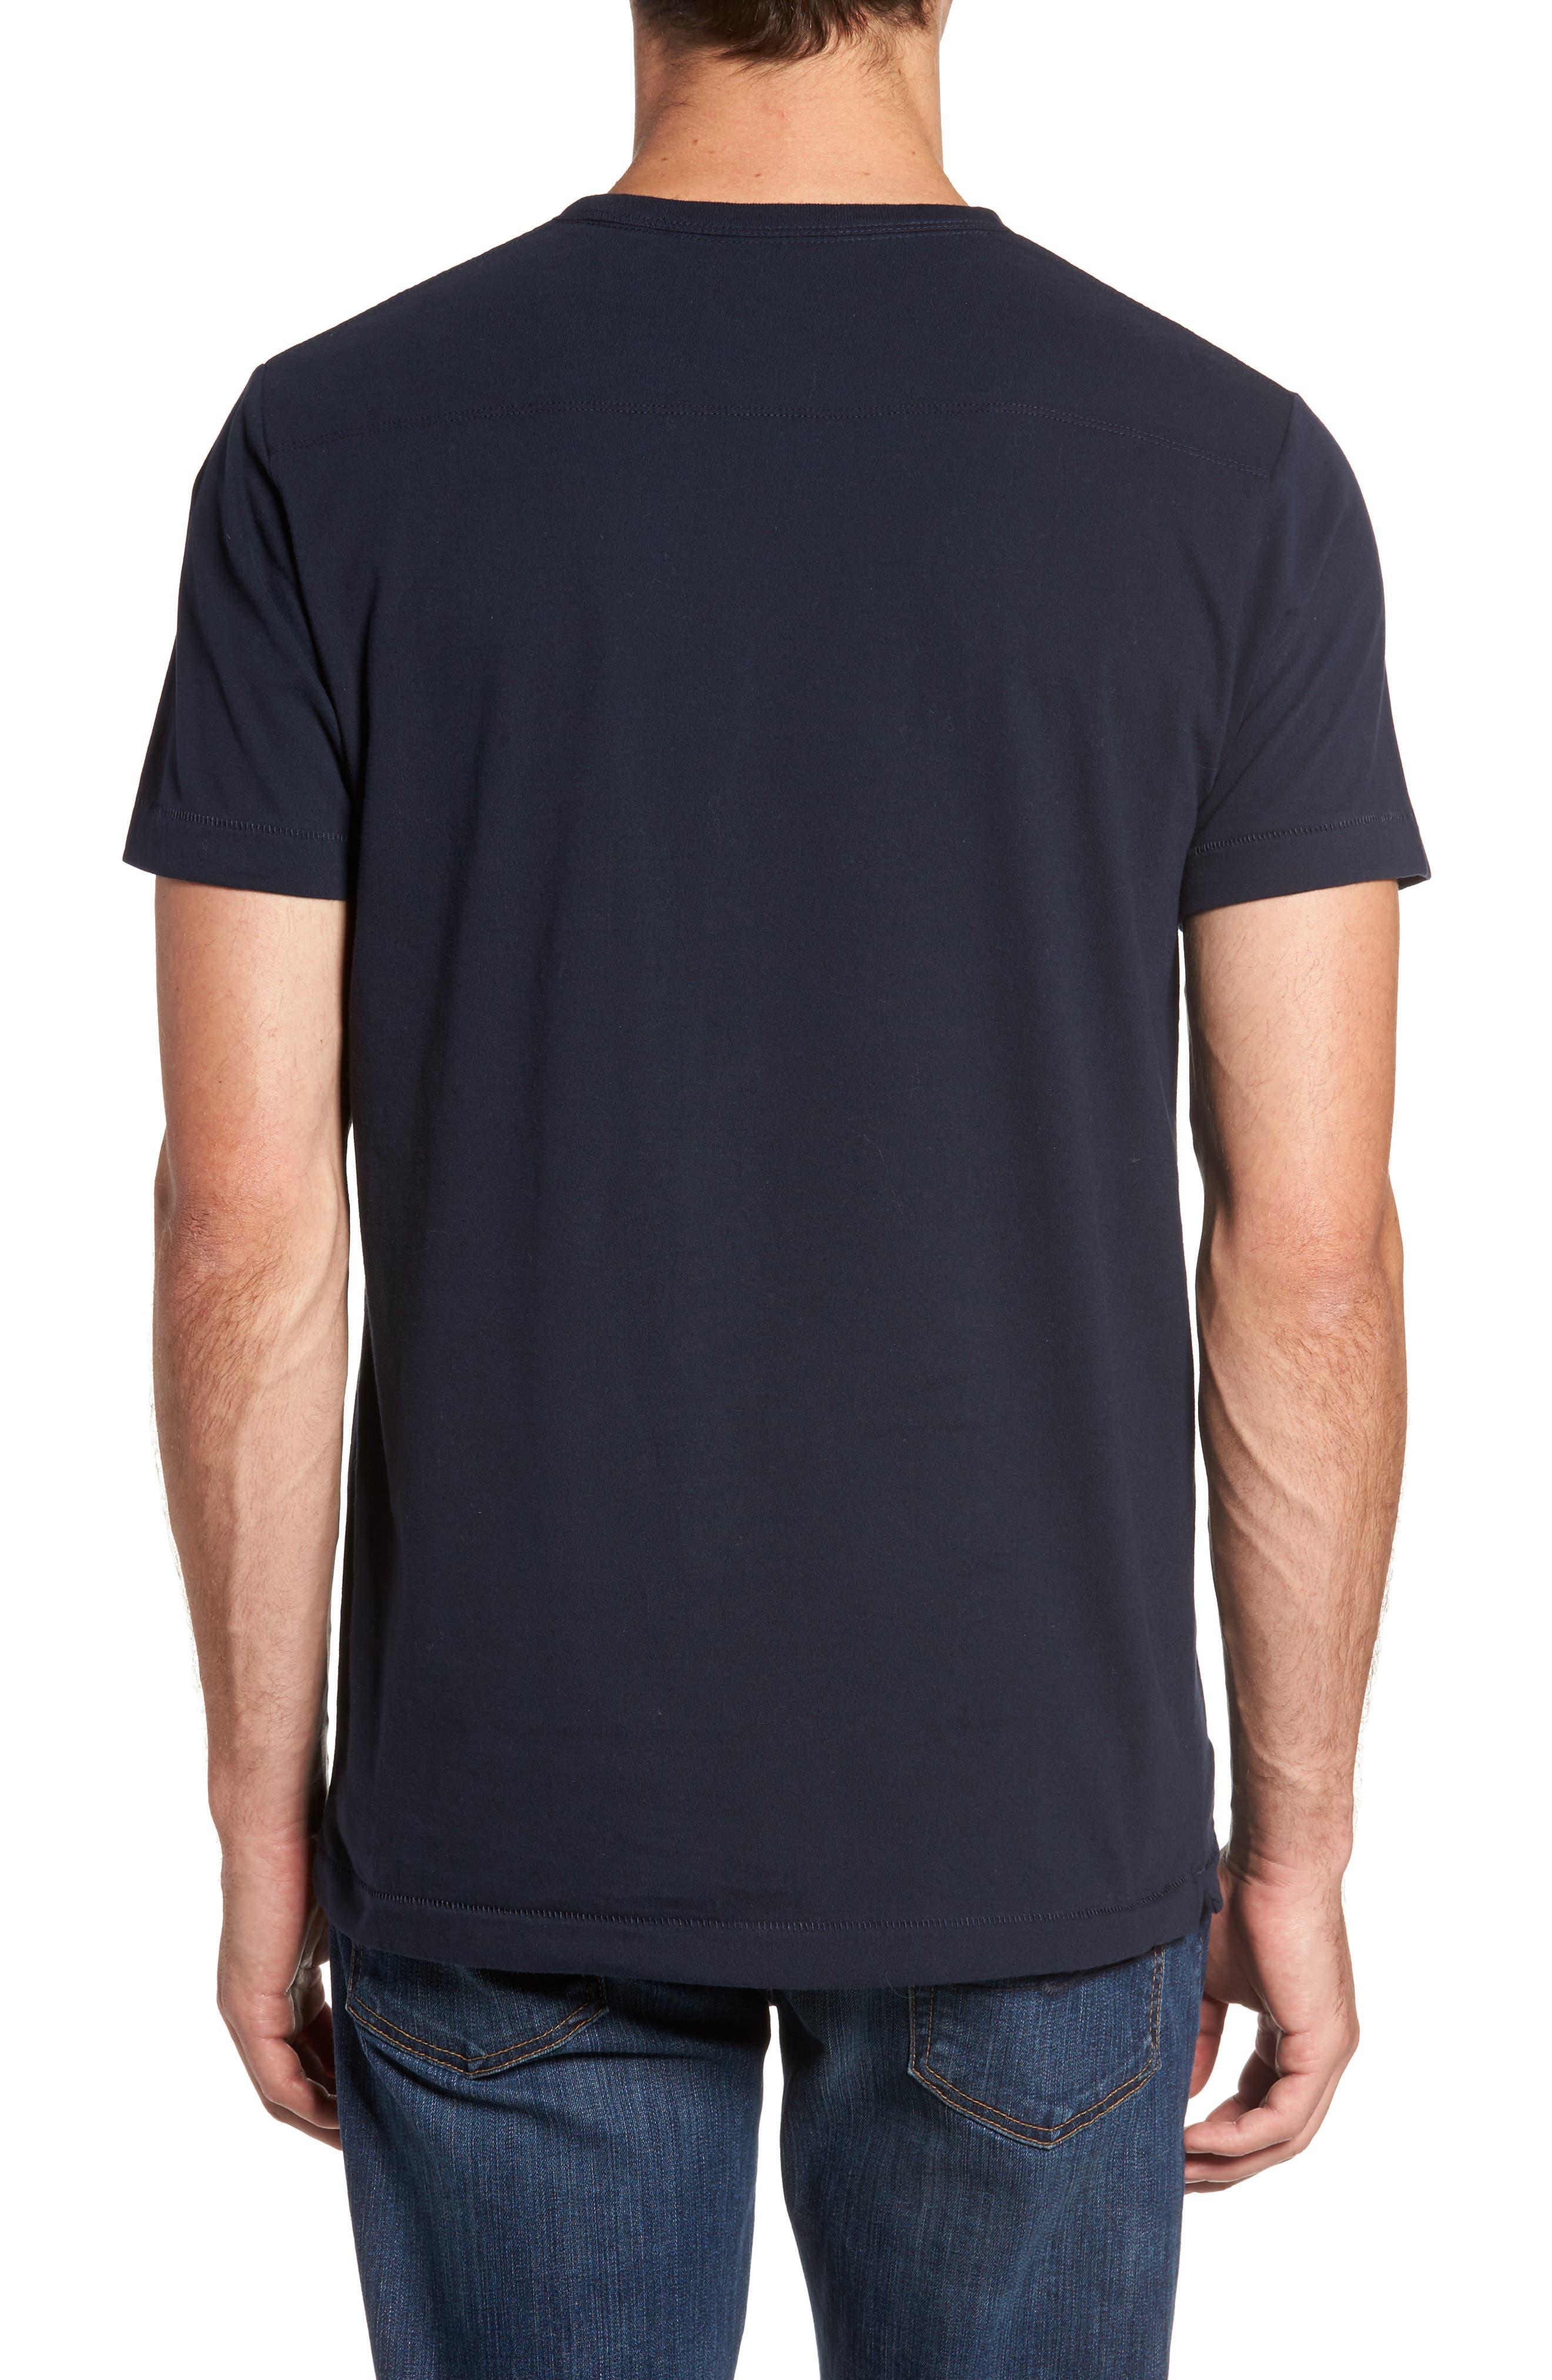 FRENCH CONNECTION,                             Comme Ci Comme Ça Regular Fit T-Shirt,                             Alternate thumbnail 2, color,                             404